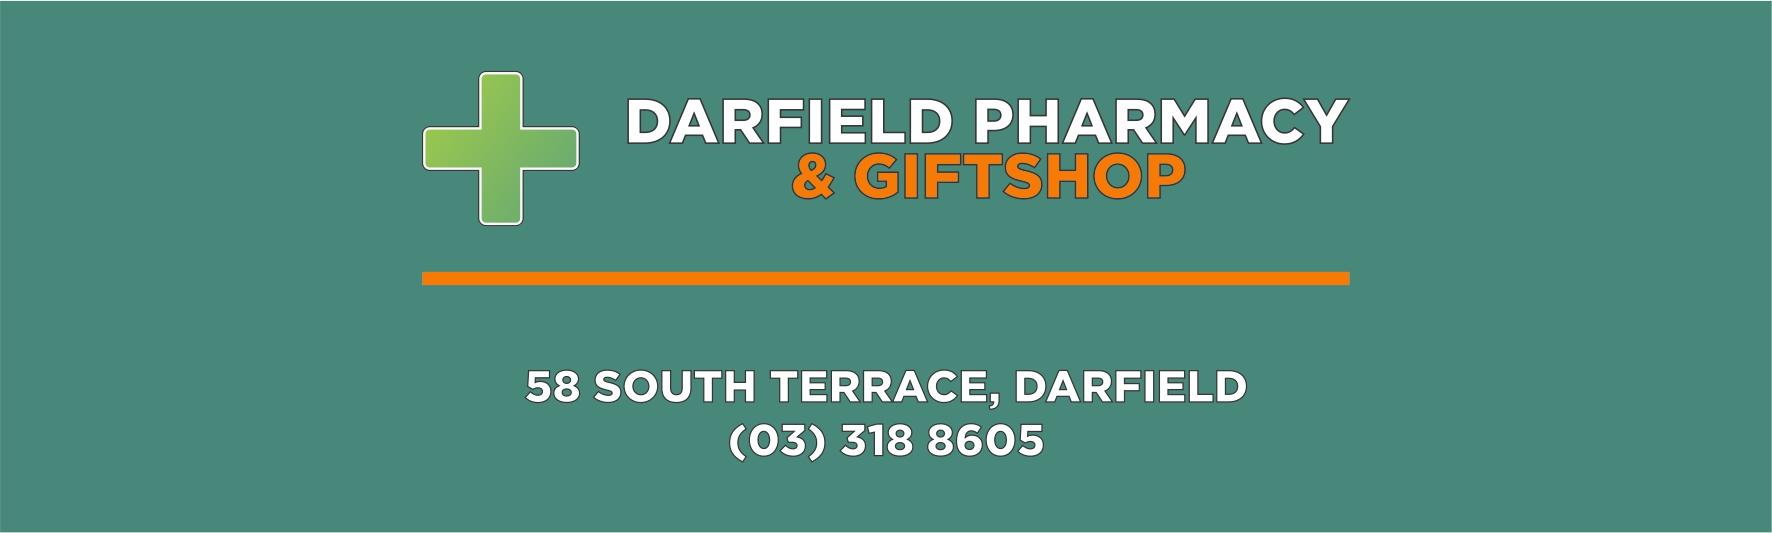 Darfield Pharmacy